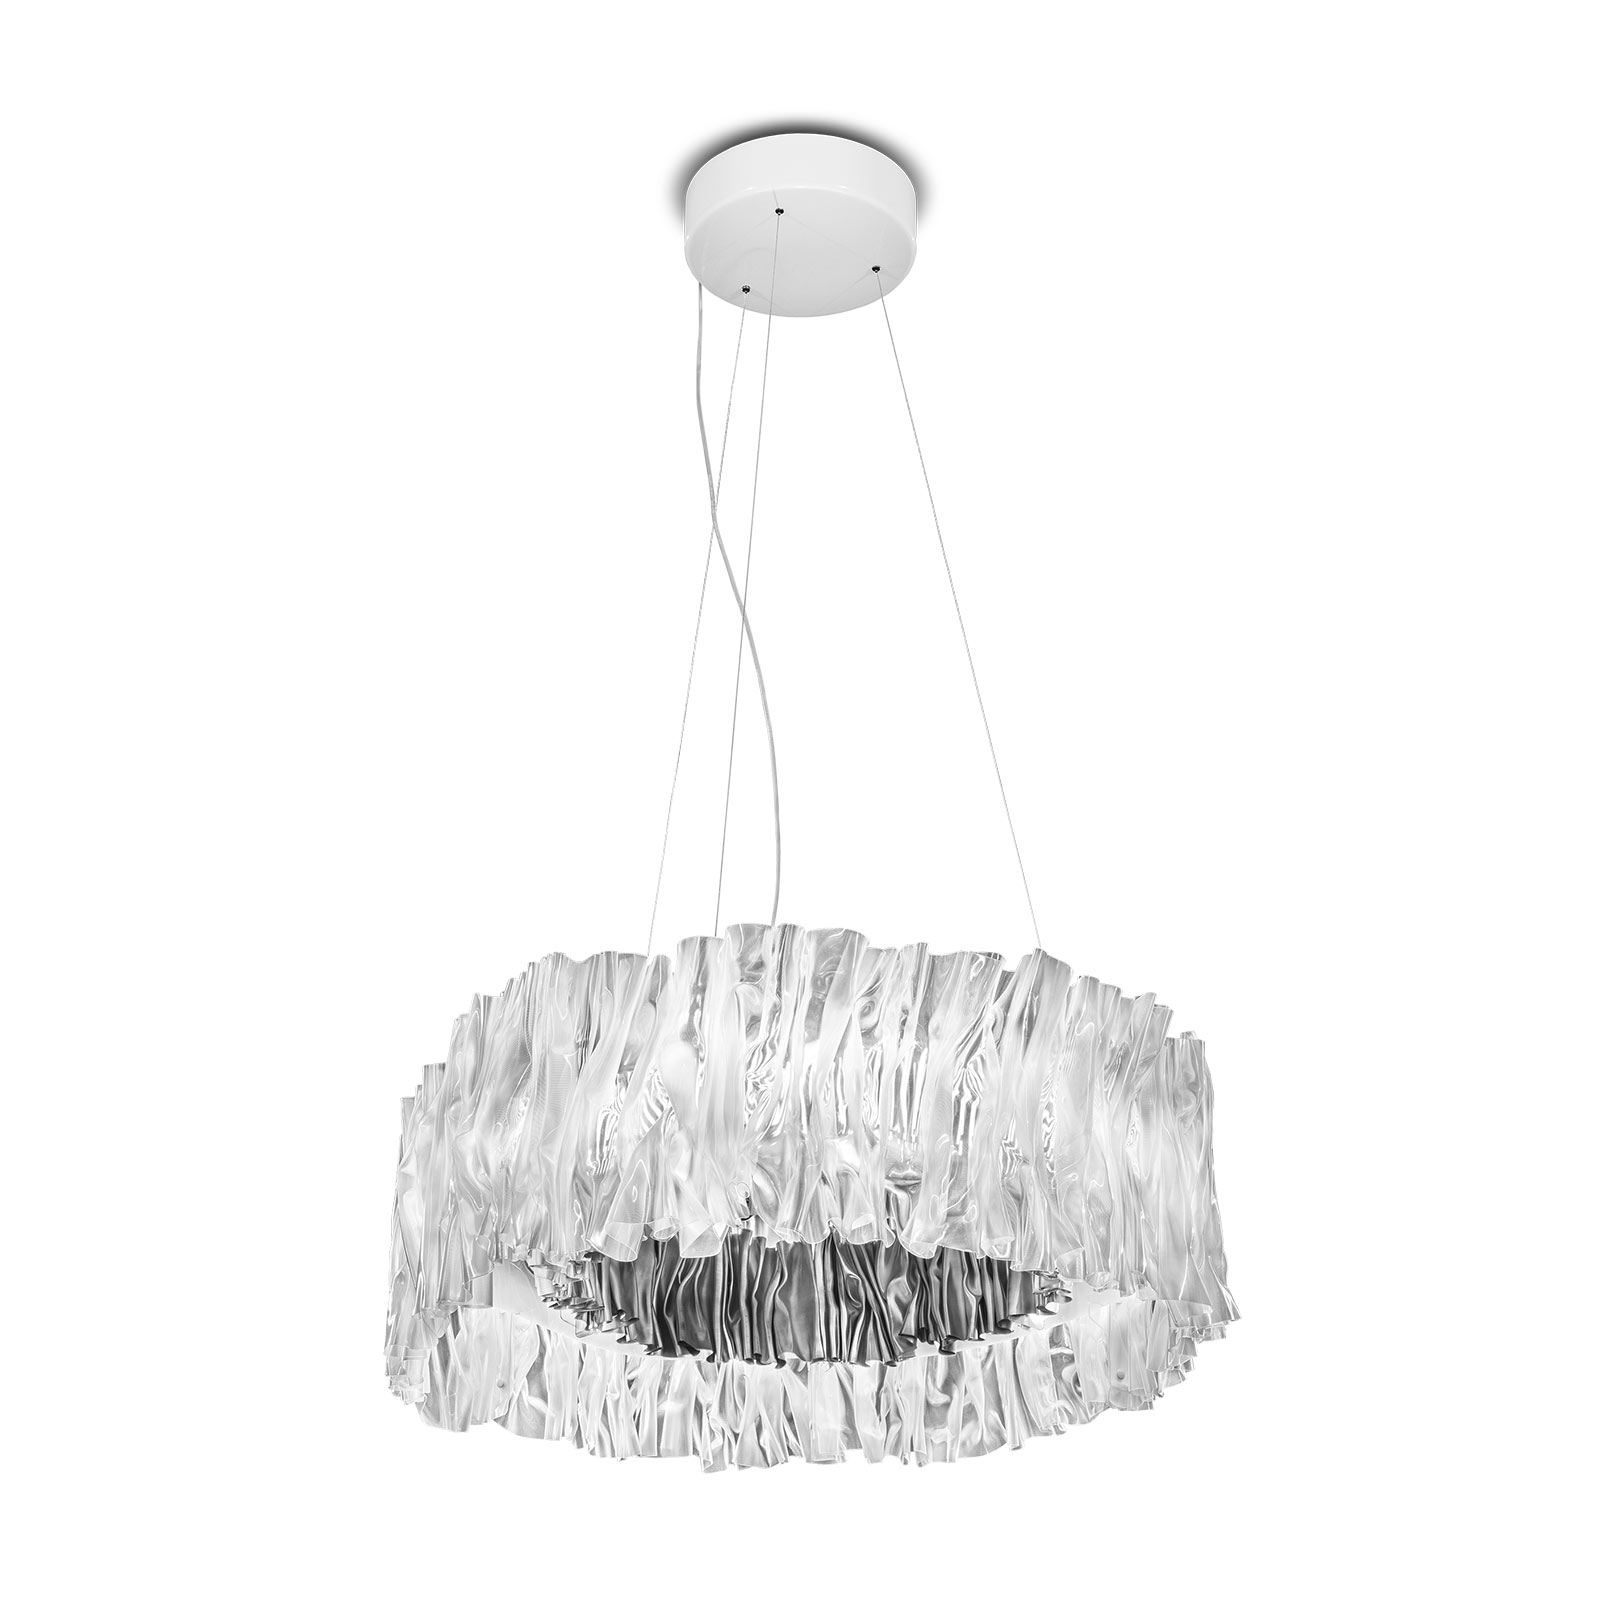 Slamp Accordéon lampa wisząca LED srebrna 3000 K